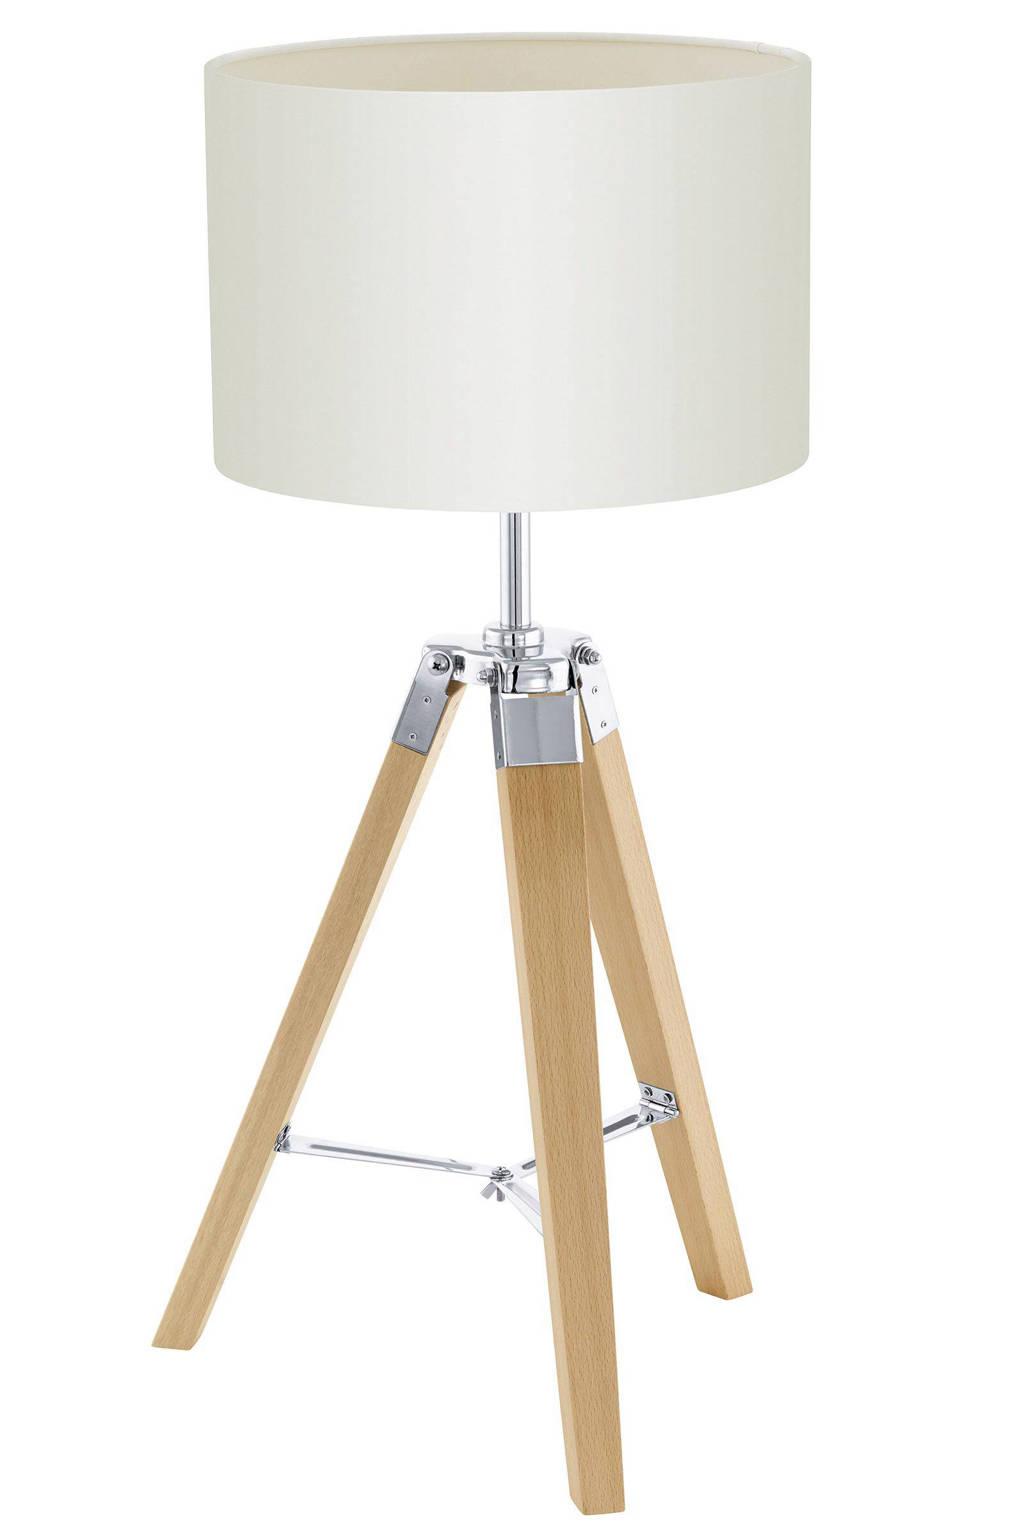 Eglo tafellamp, Beige/bruin